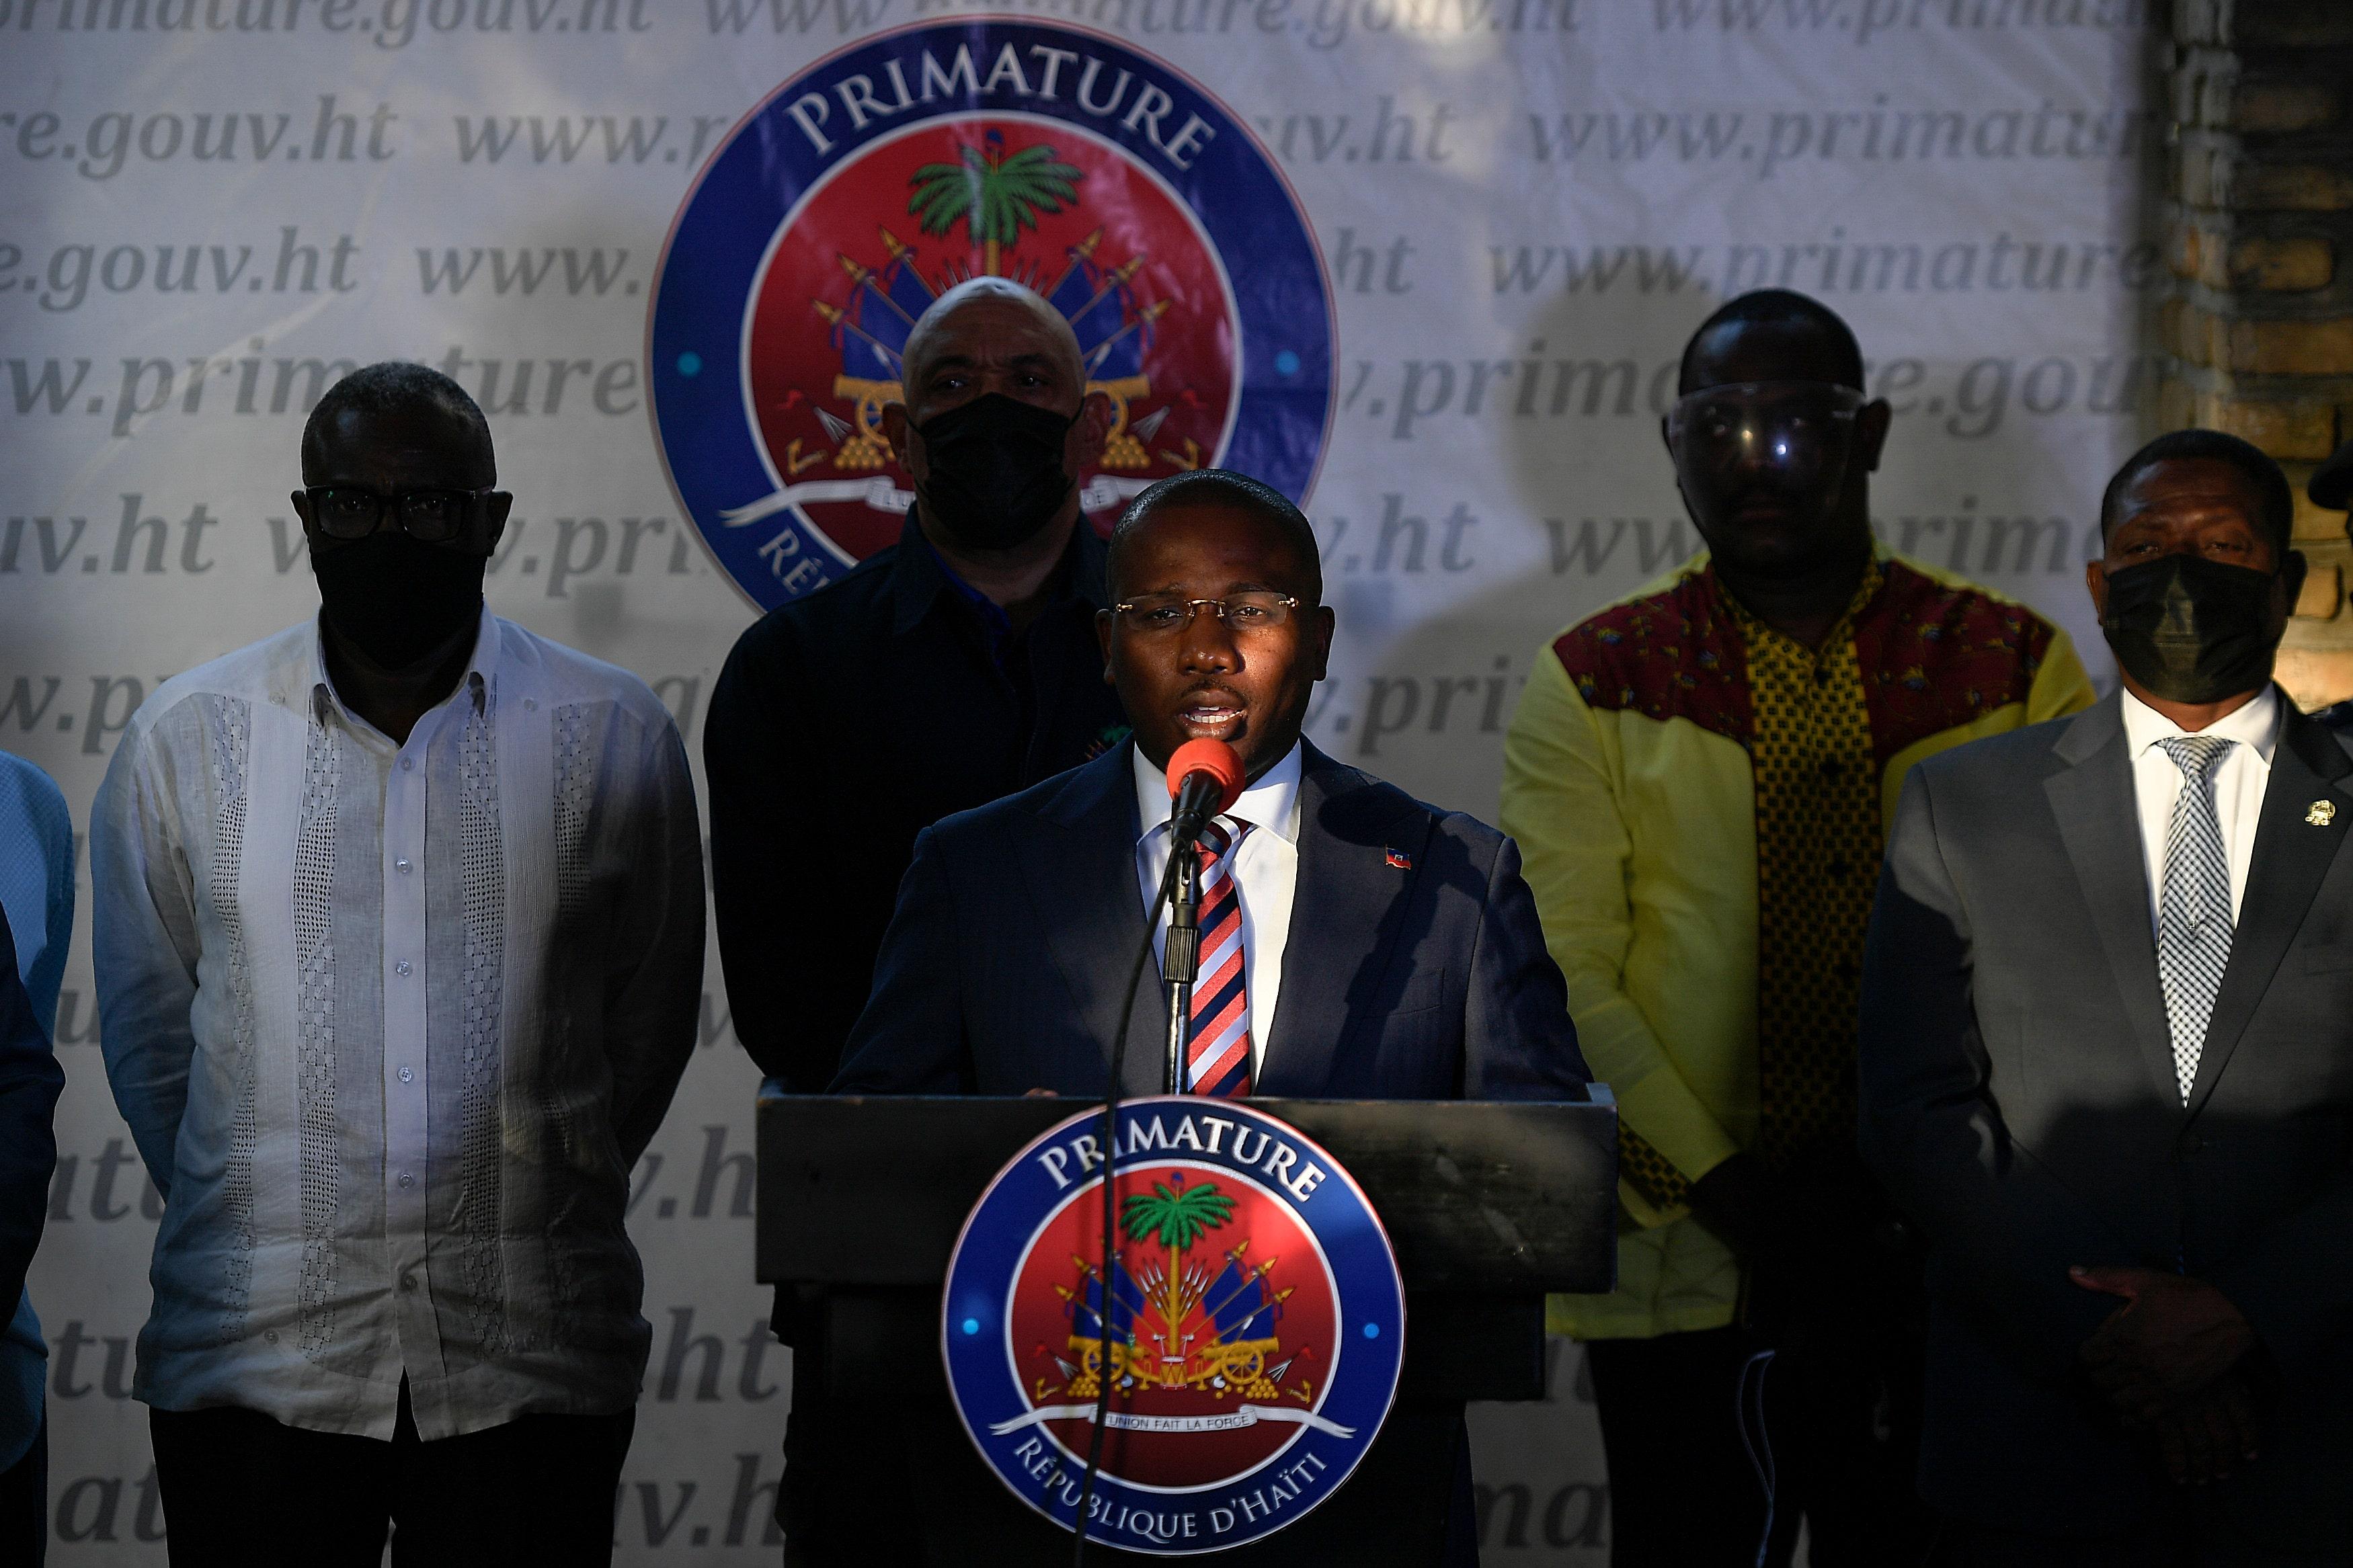 Haiti president assassination: Florida-based suspect planned to take presidency, police claim